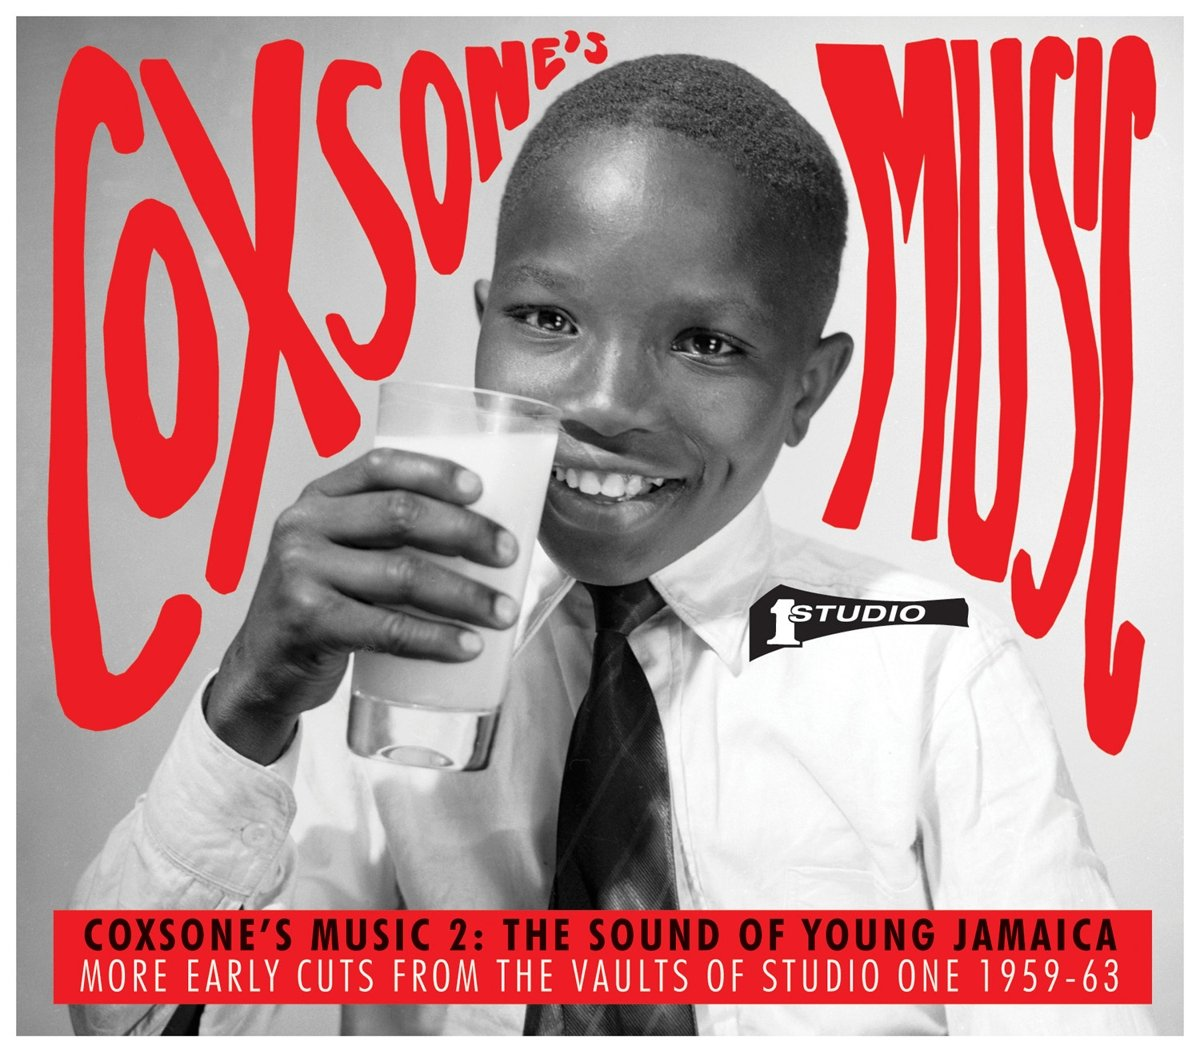 CD : Soul Jazz Records Presents - Coxsone's Music 2 (CD)